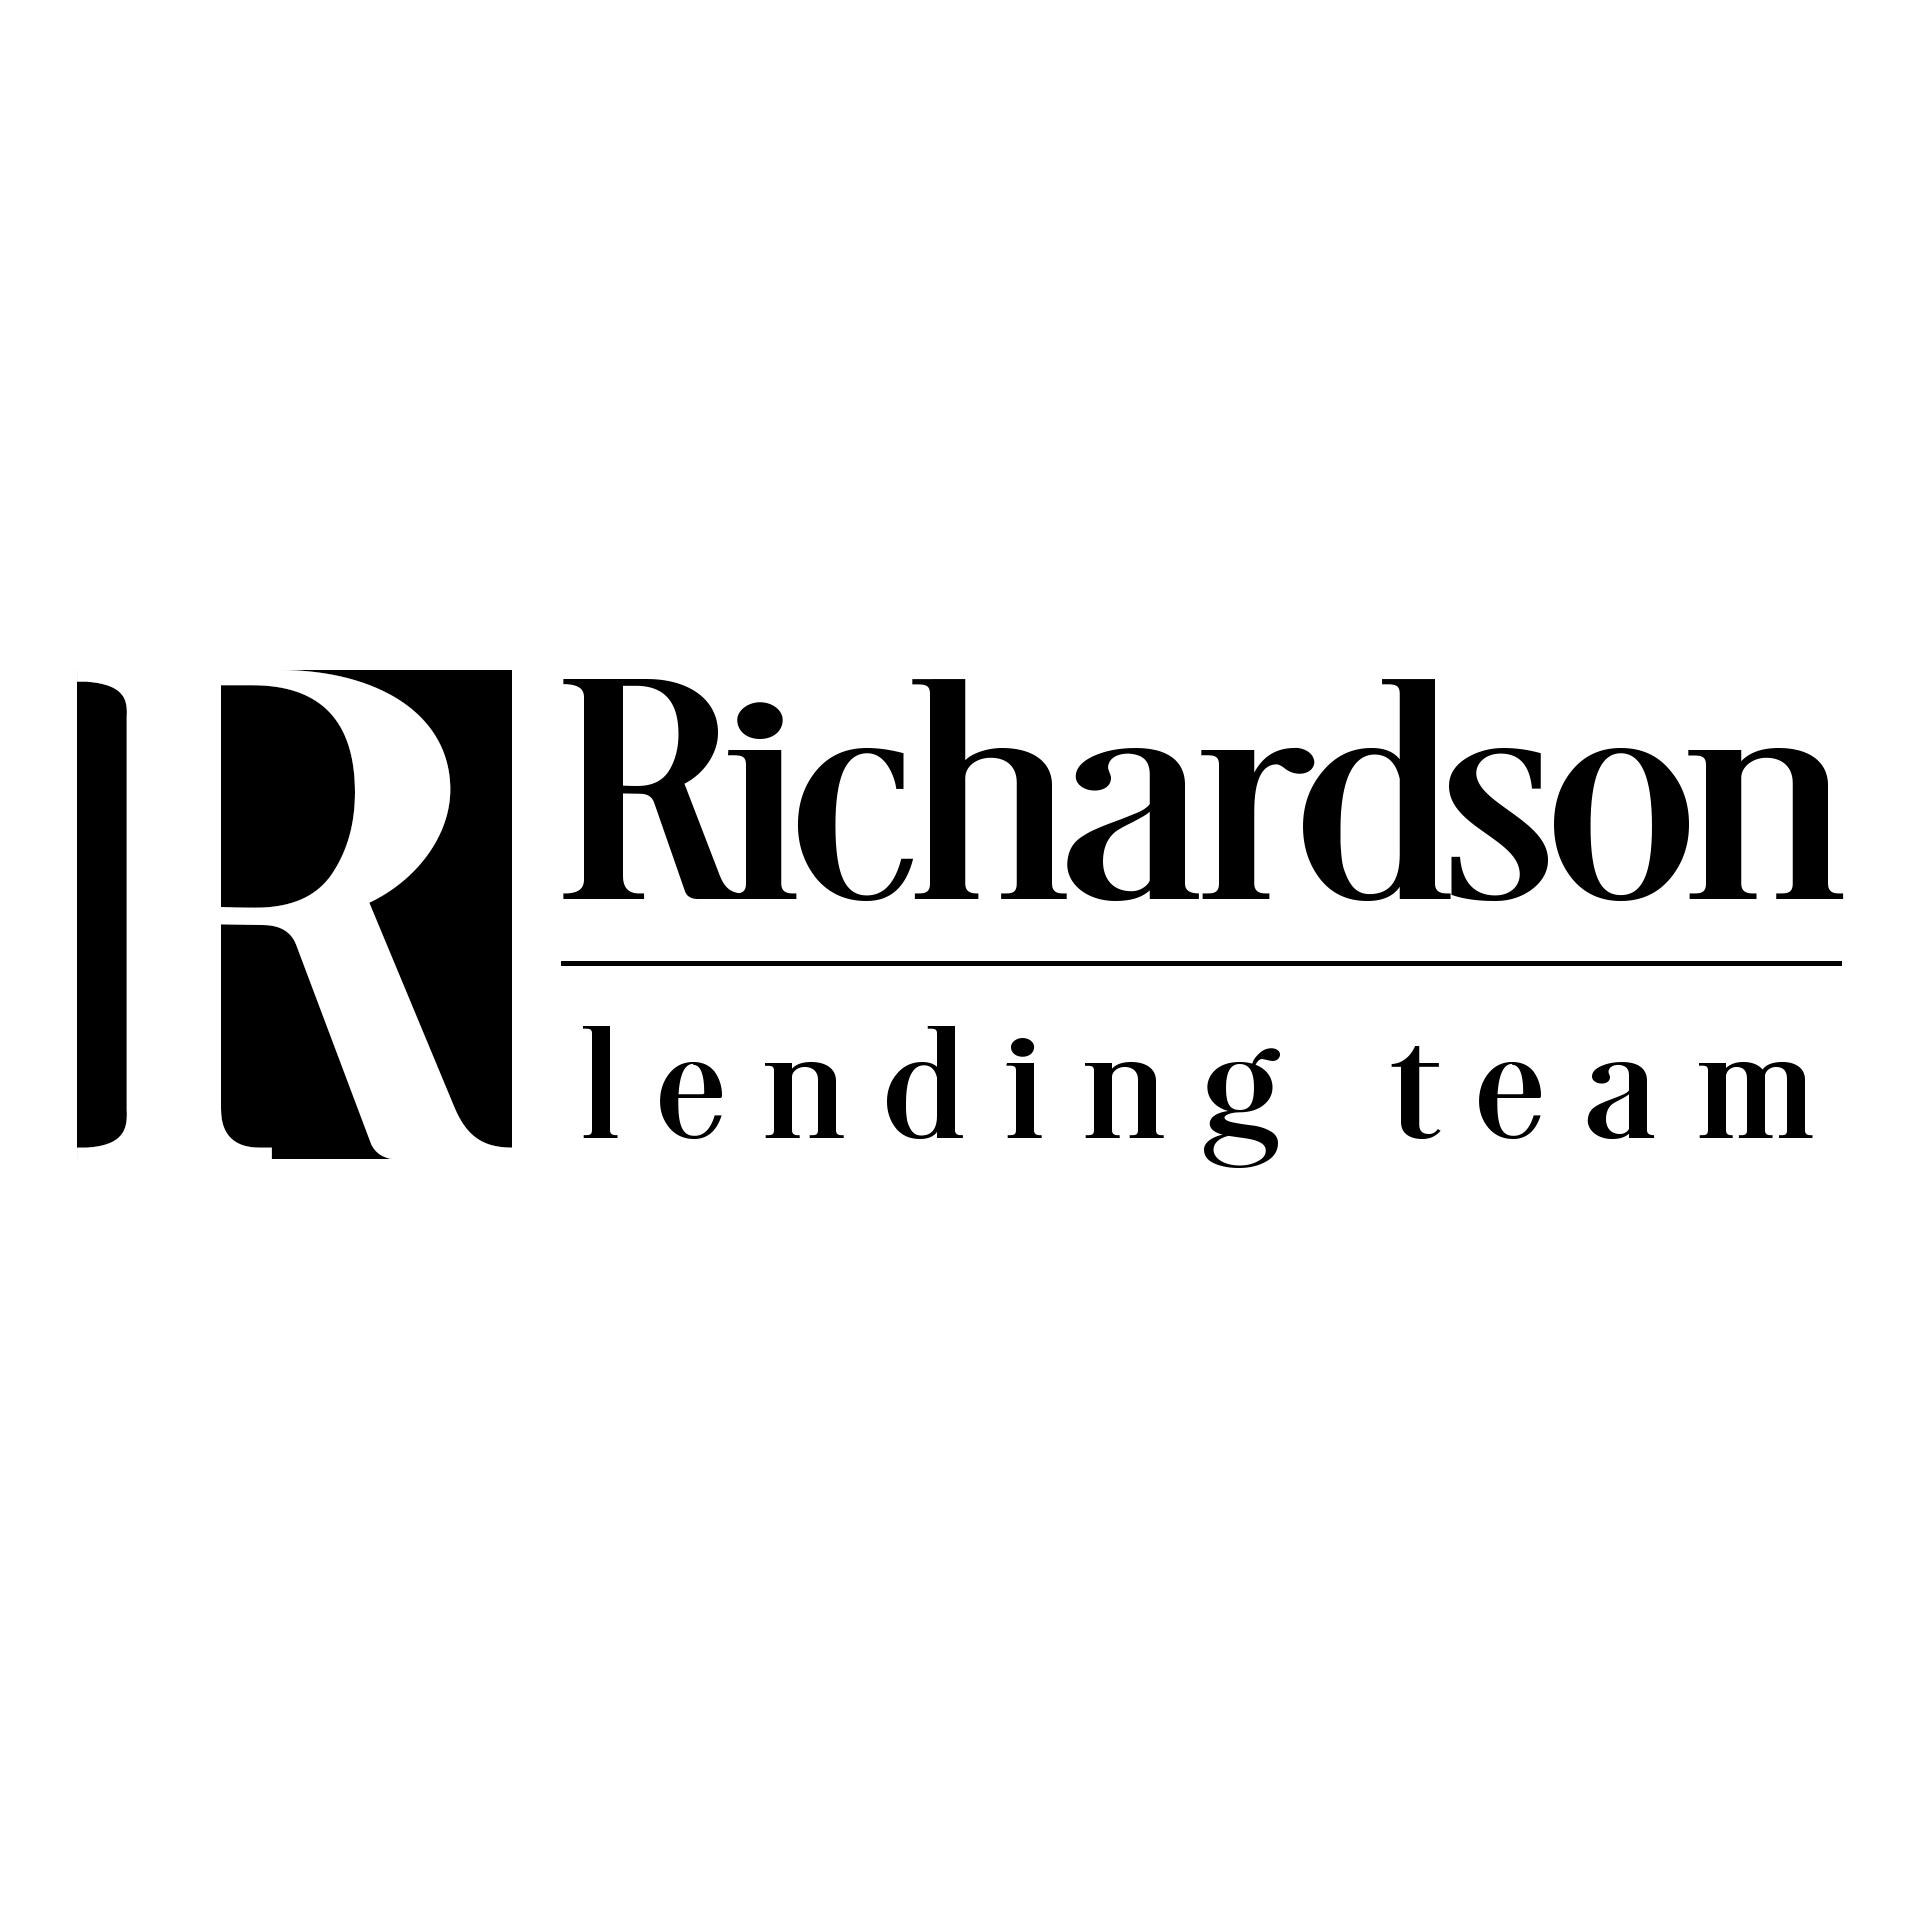 Jason R. Richardson at Mid America Mortgage